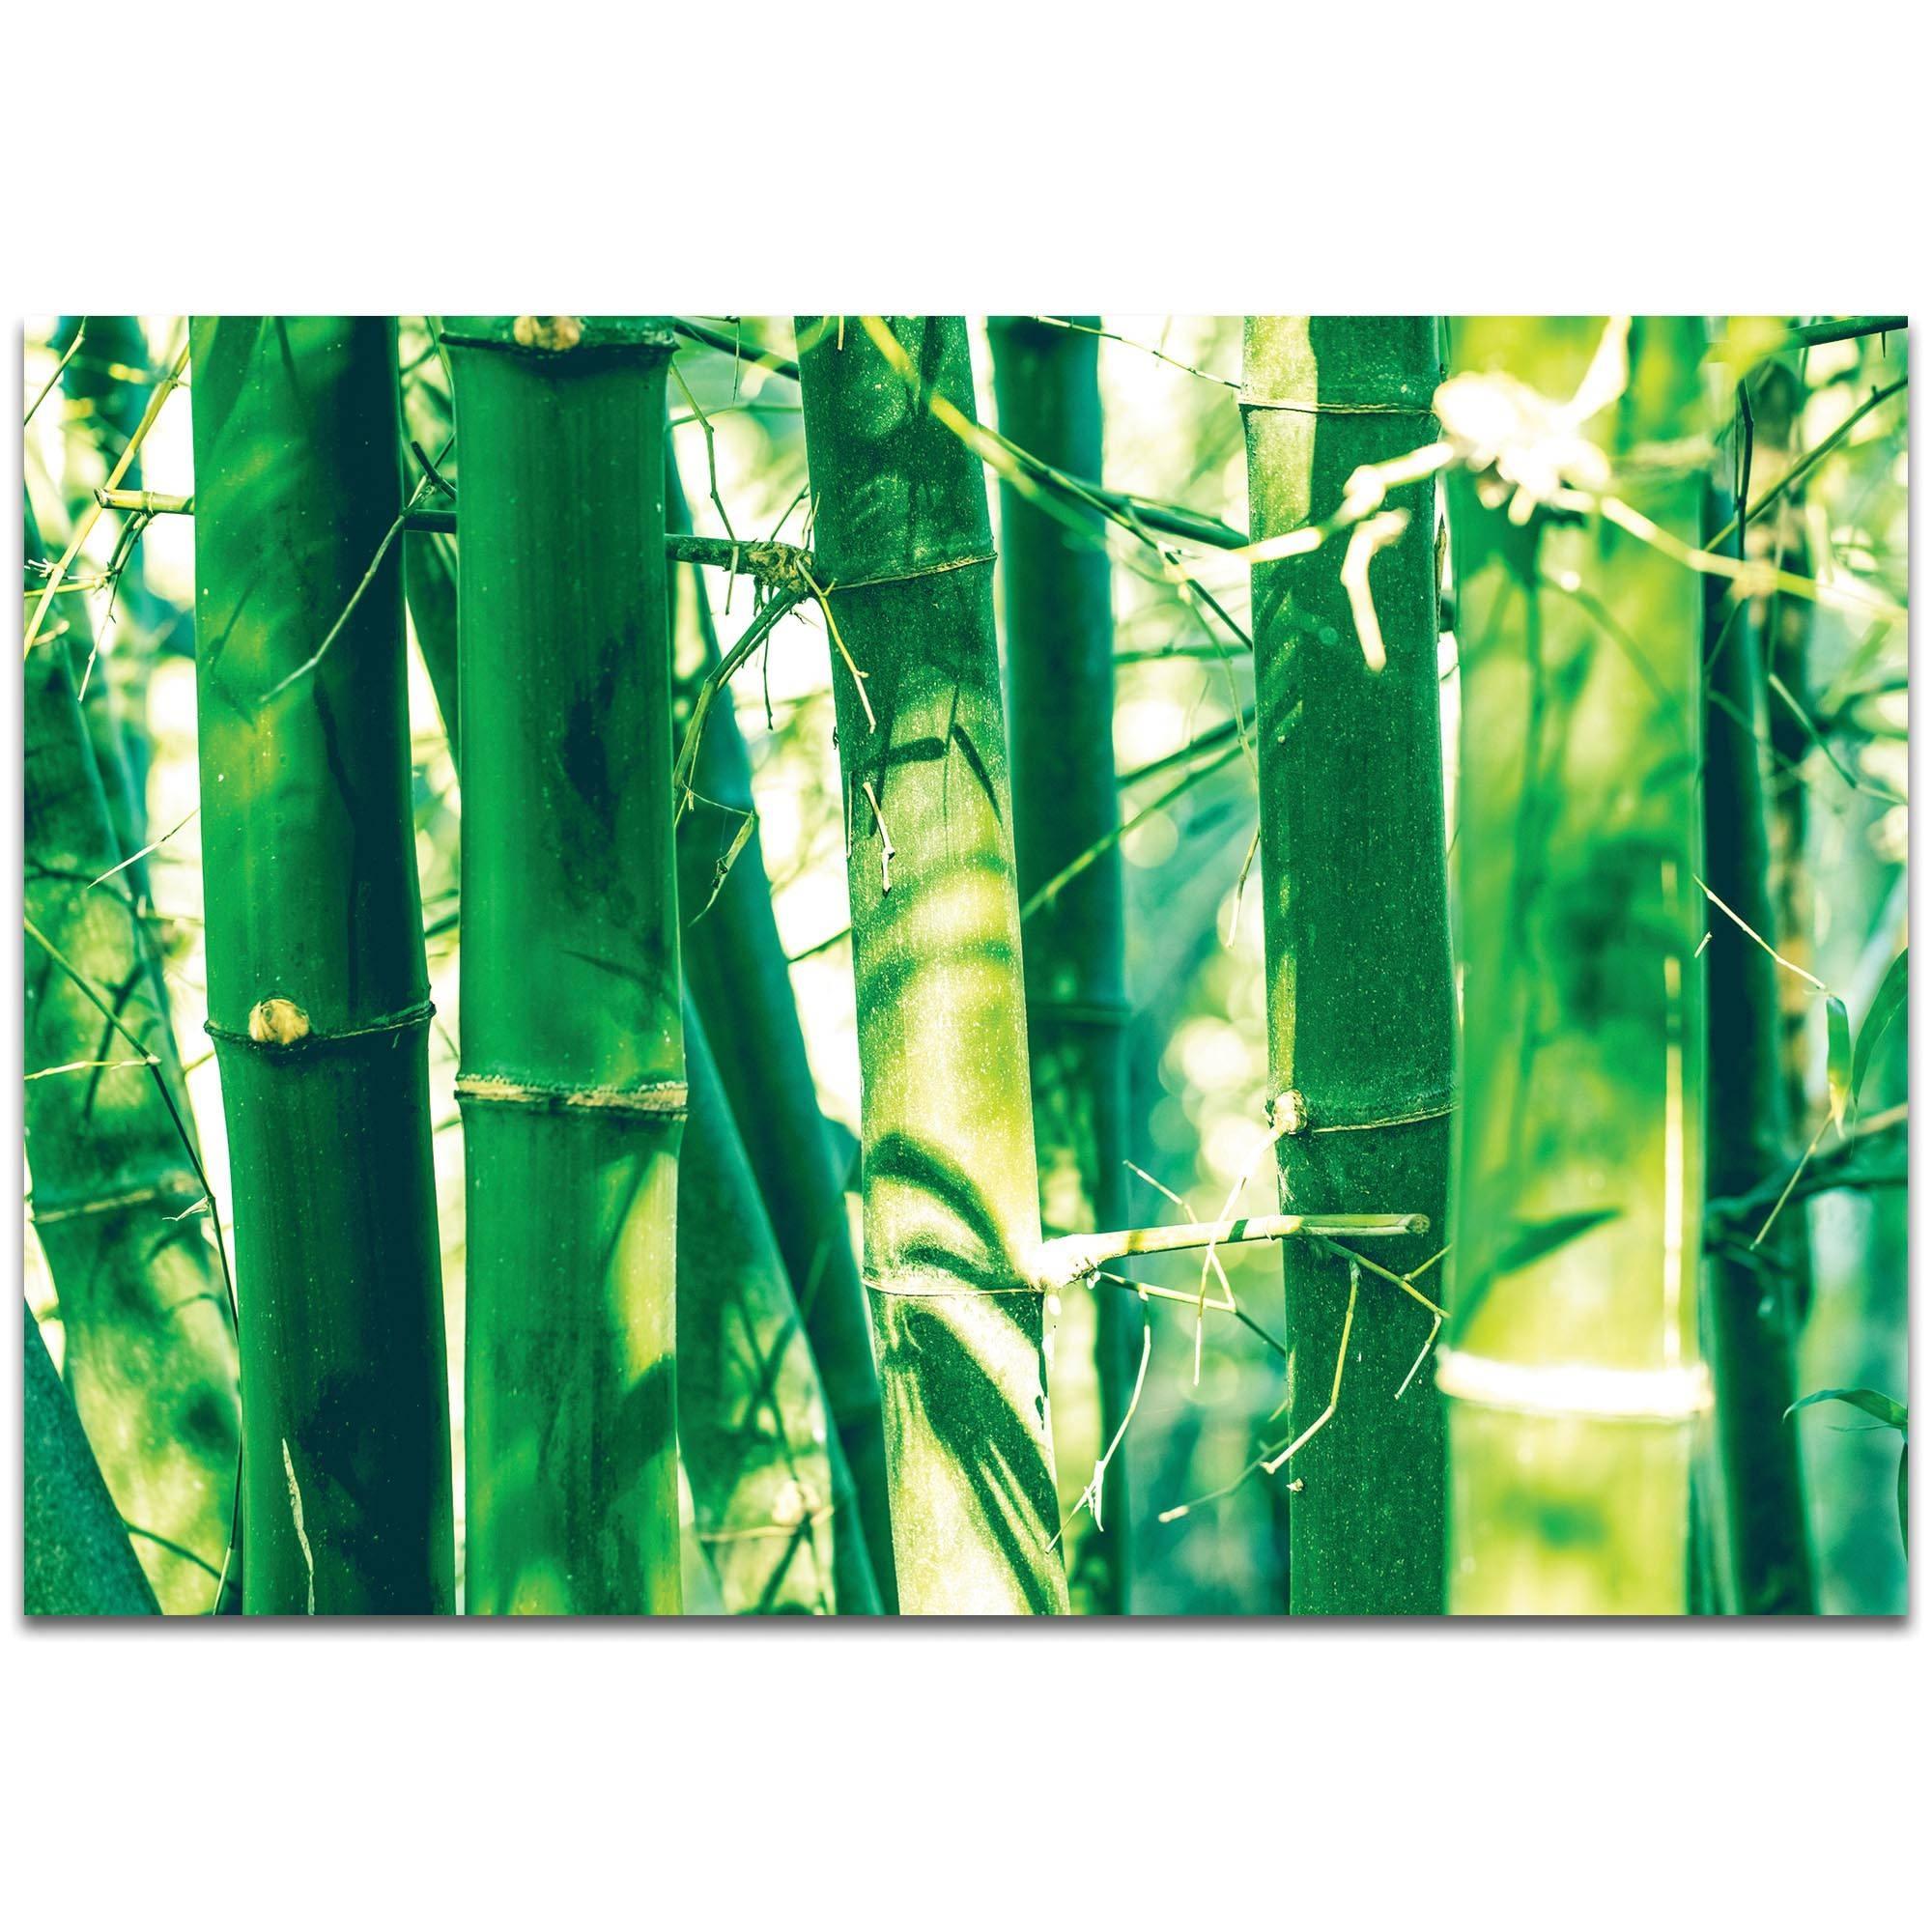 Metal Art Studio – Bamboo Forestmeirav Levy – Nature Regarding Most Current Bamboo Metal Wall Art (View 24 of 25)